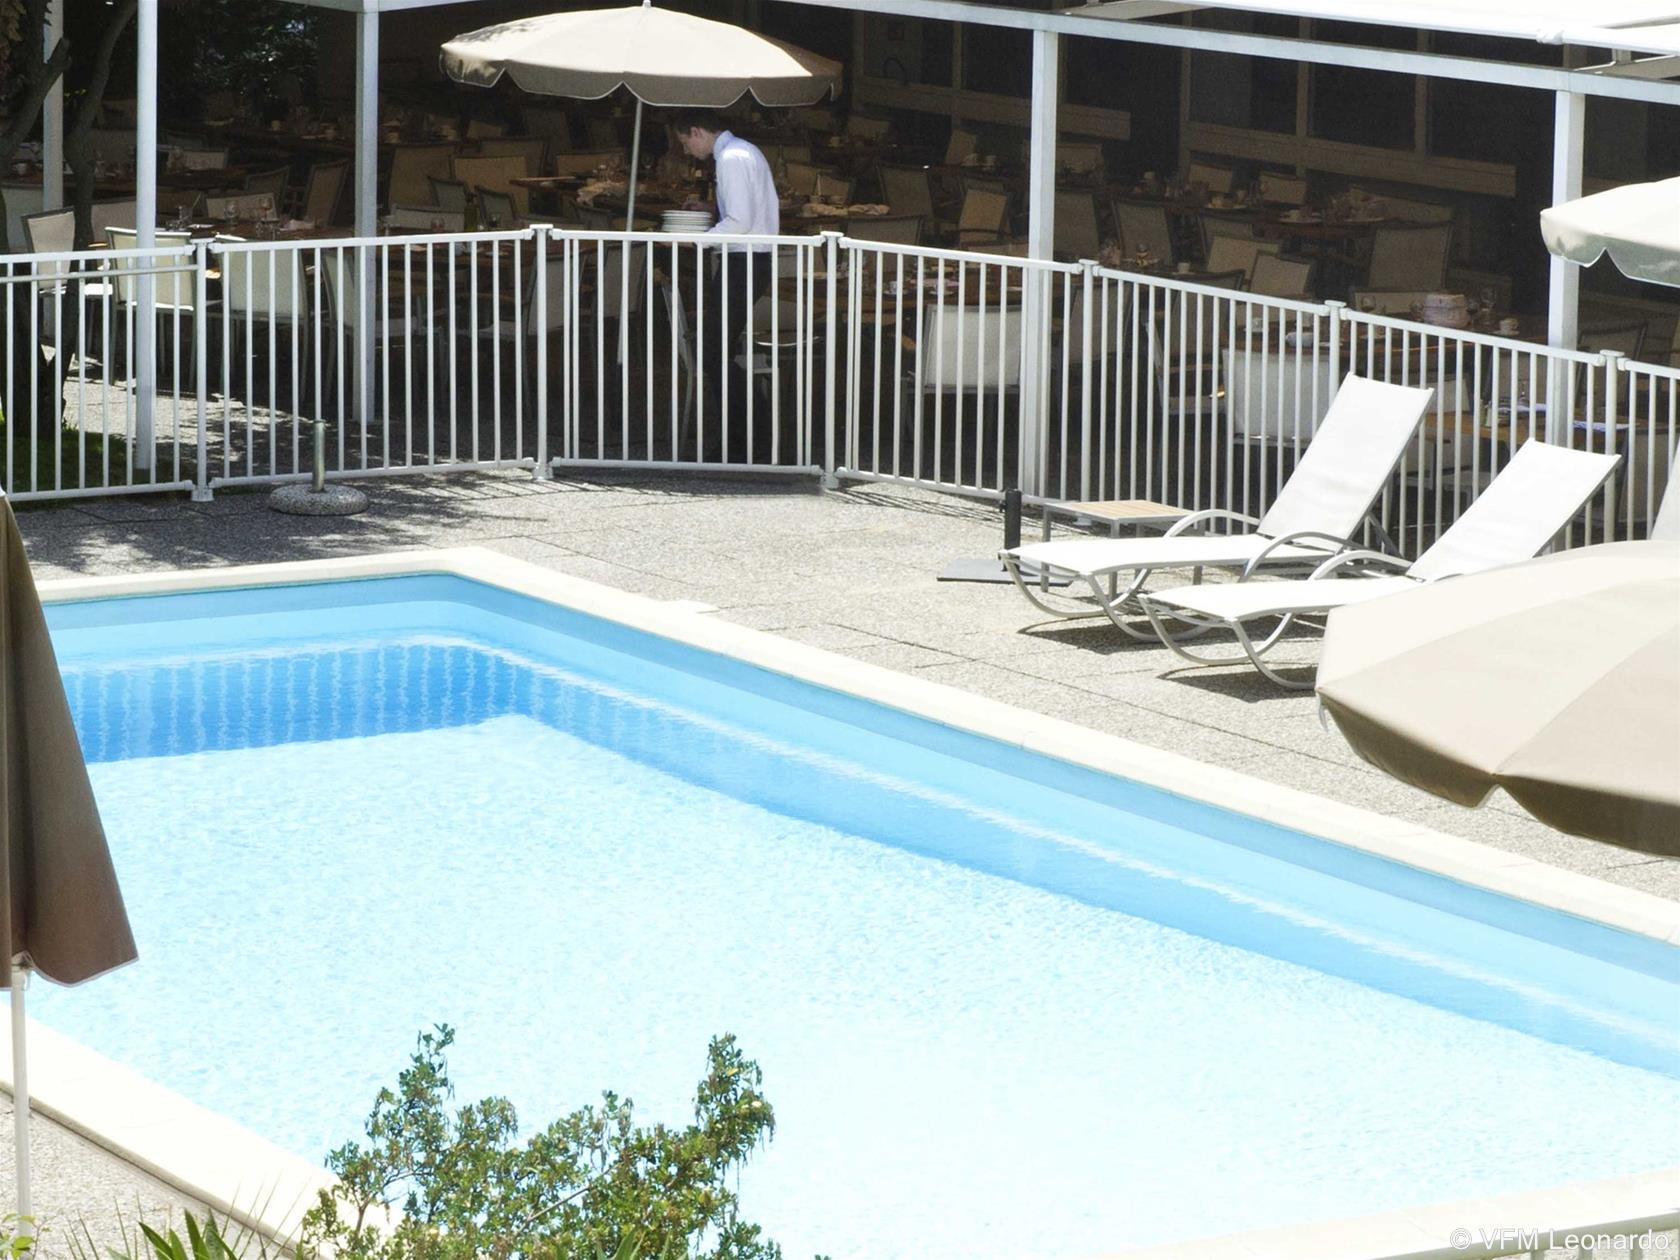 Hotel Aix En Provence Gare Tgv